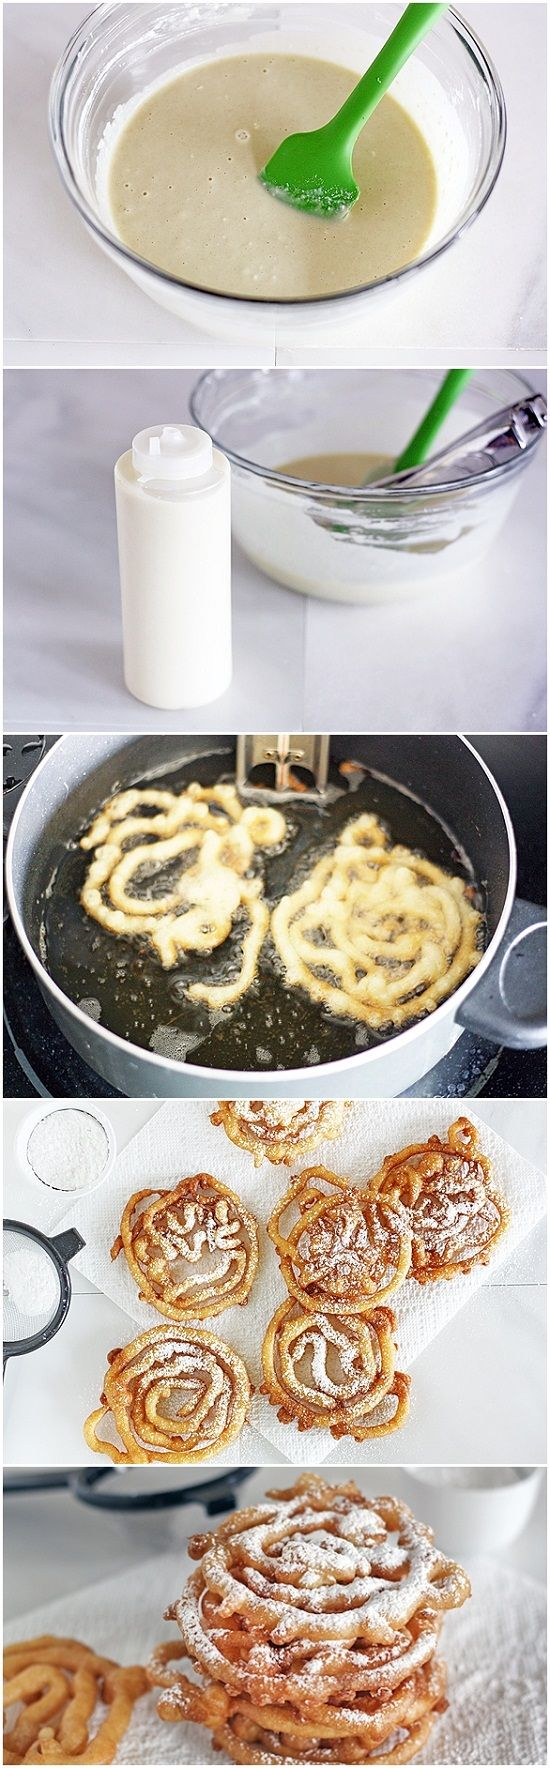 DIY Mini Funnel Cakes @deb rouse schwedhelm rouse schwedhelm rouse schwedhelm rouse schwedhelm Larson